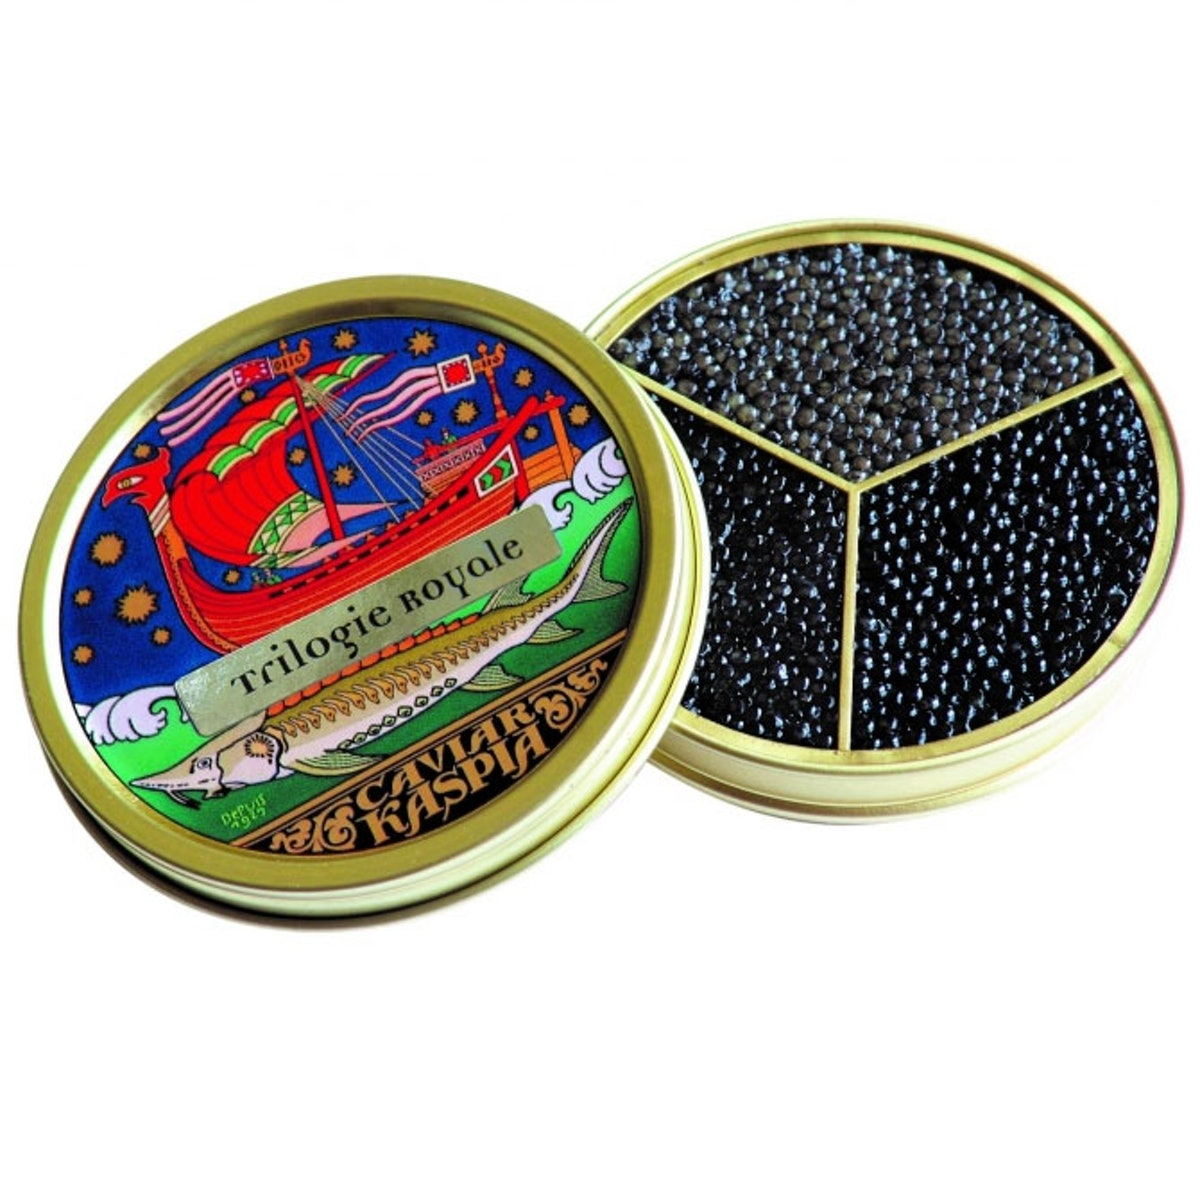 Caviar Kaspia Royal Trilogy